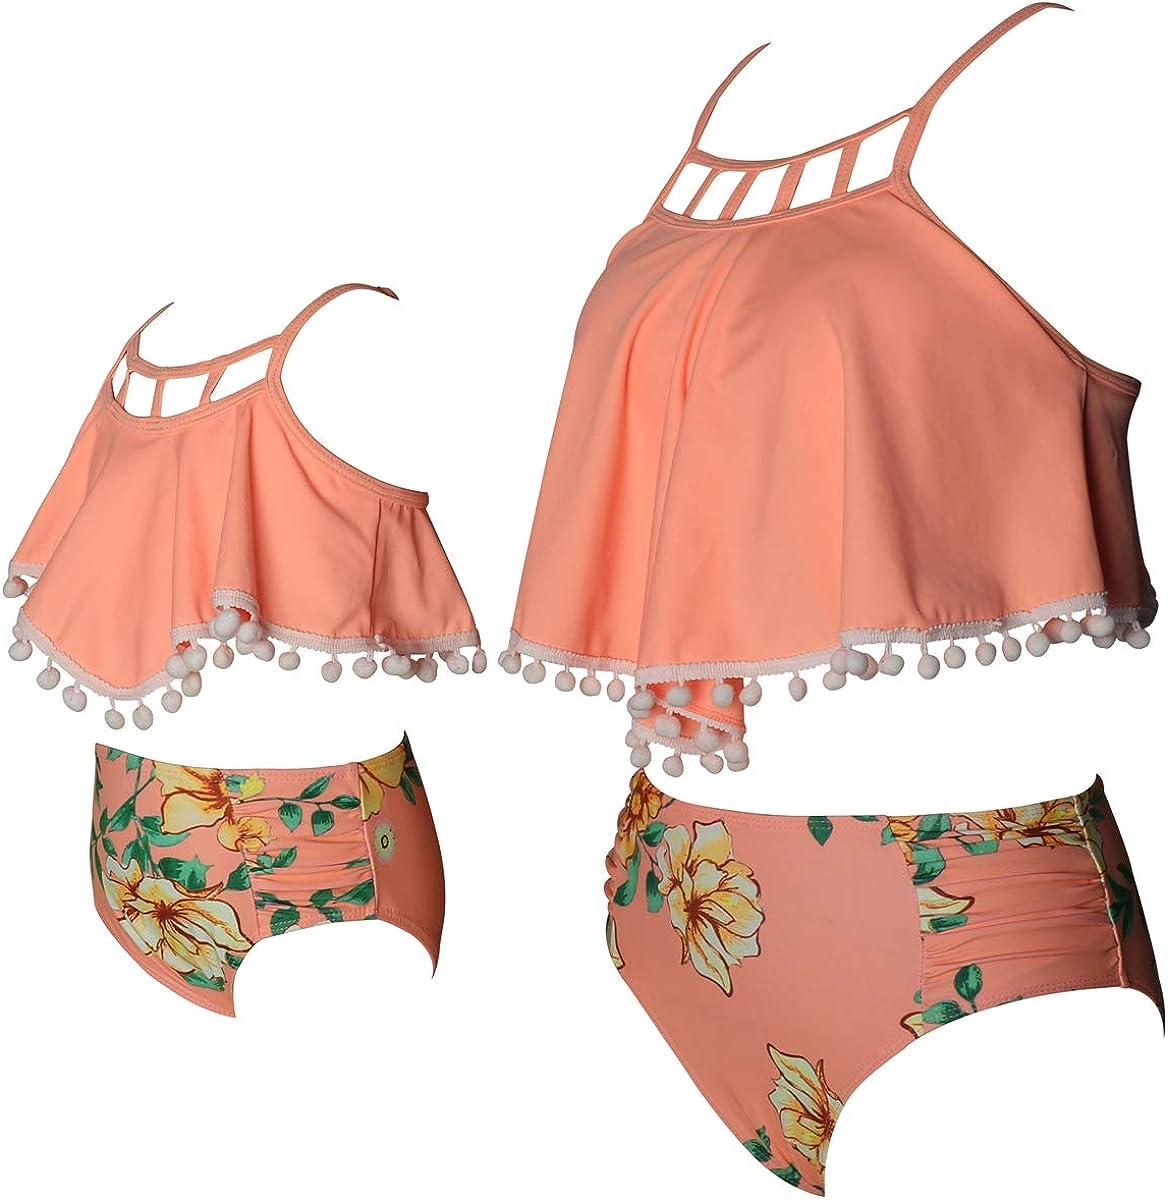 Toddler Kids Baby Girls Bikini Swimsuit Set Family Matching Mother Girl Swimwear